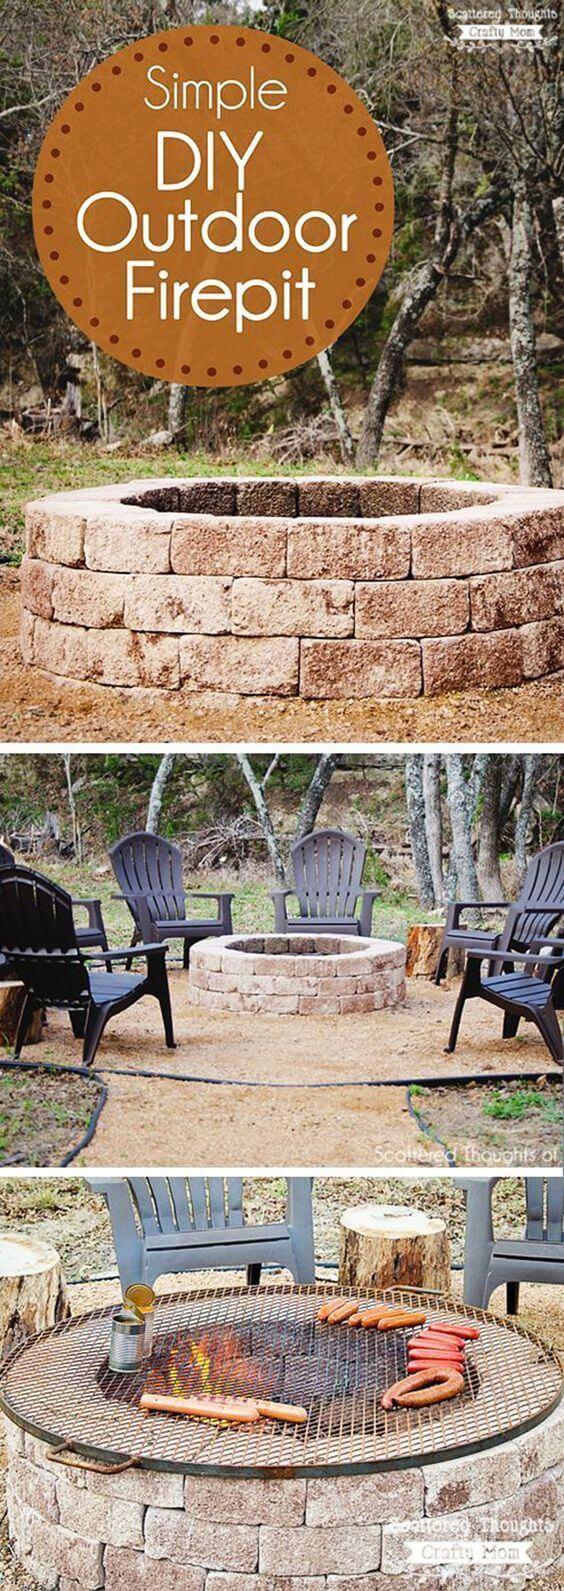 Simple DIY Round Stone Firepit